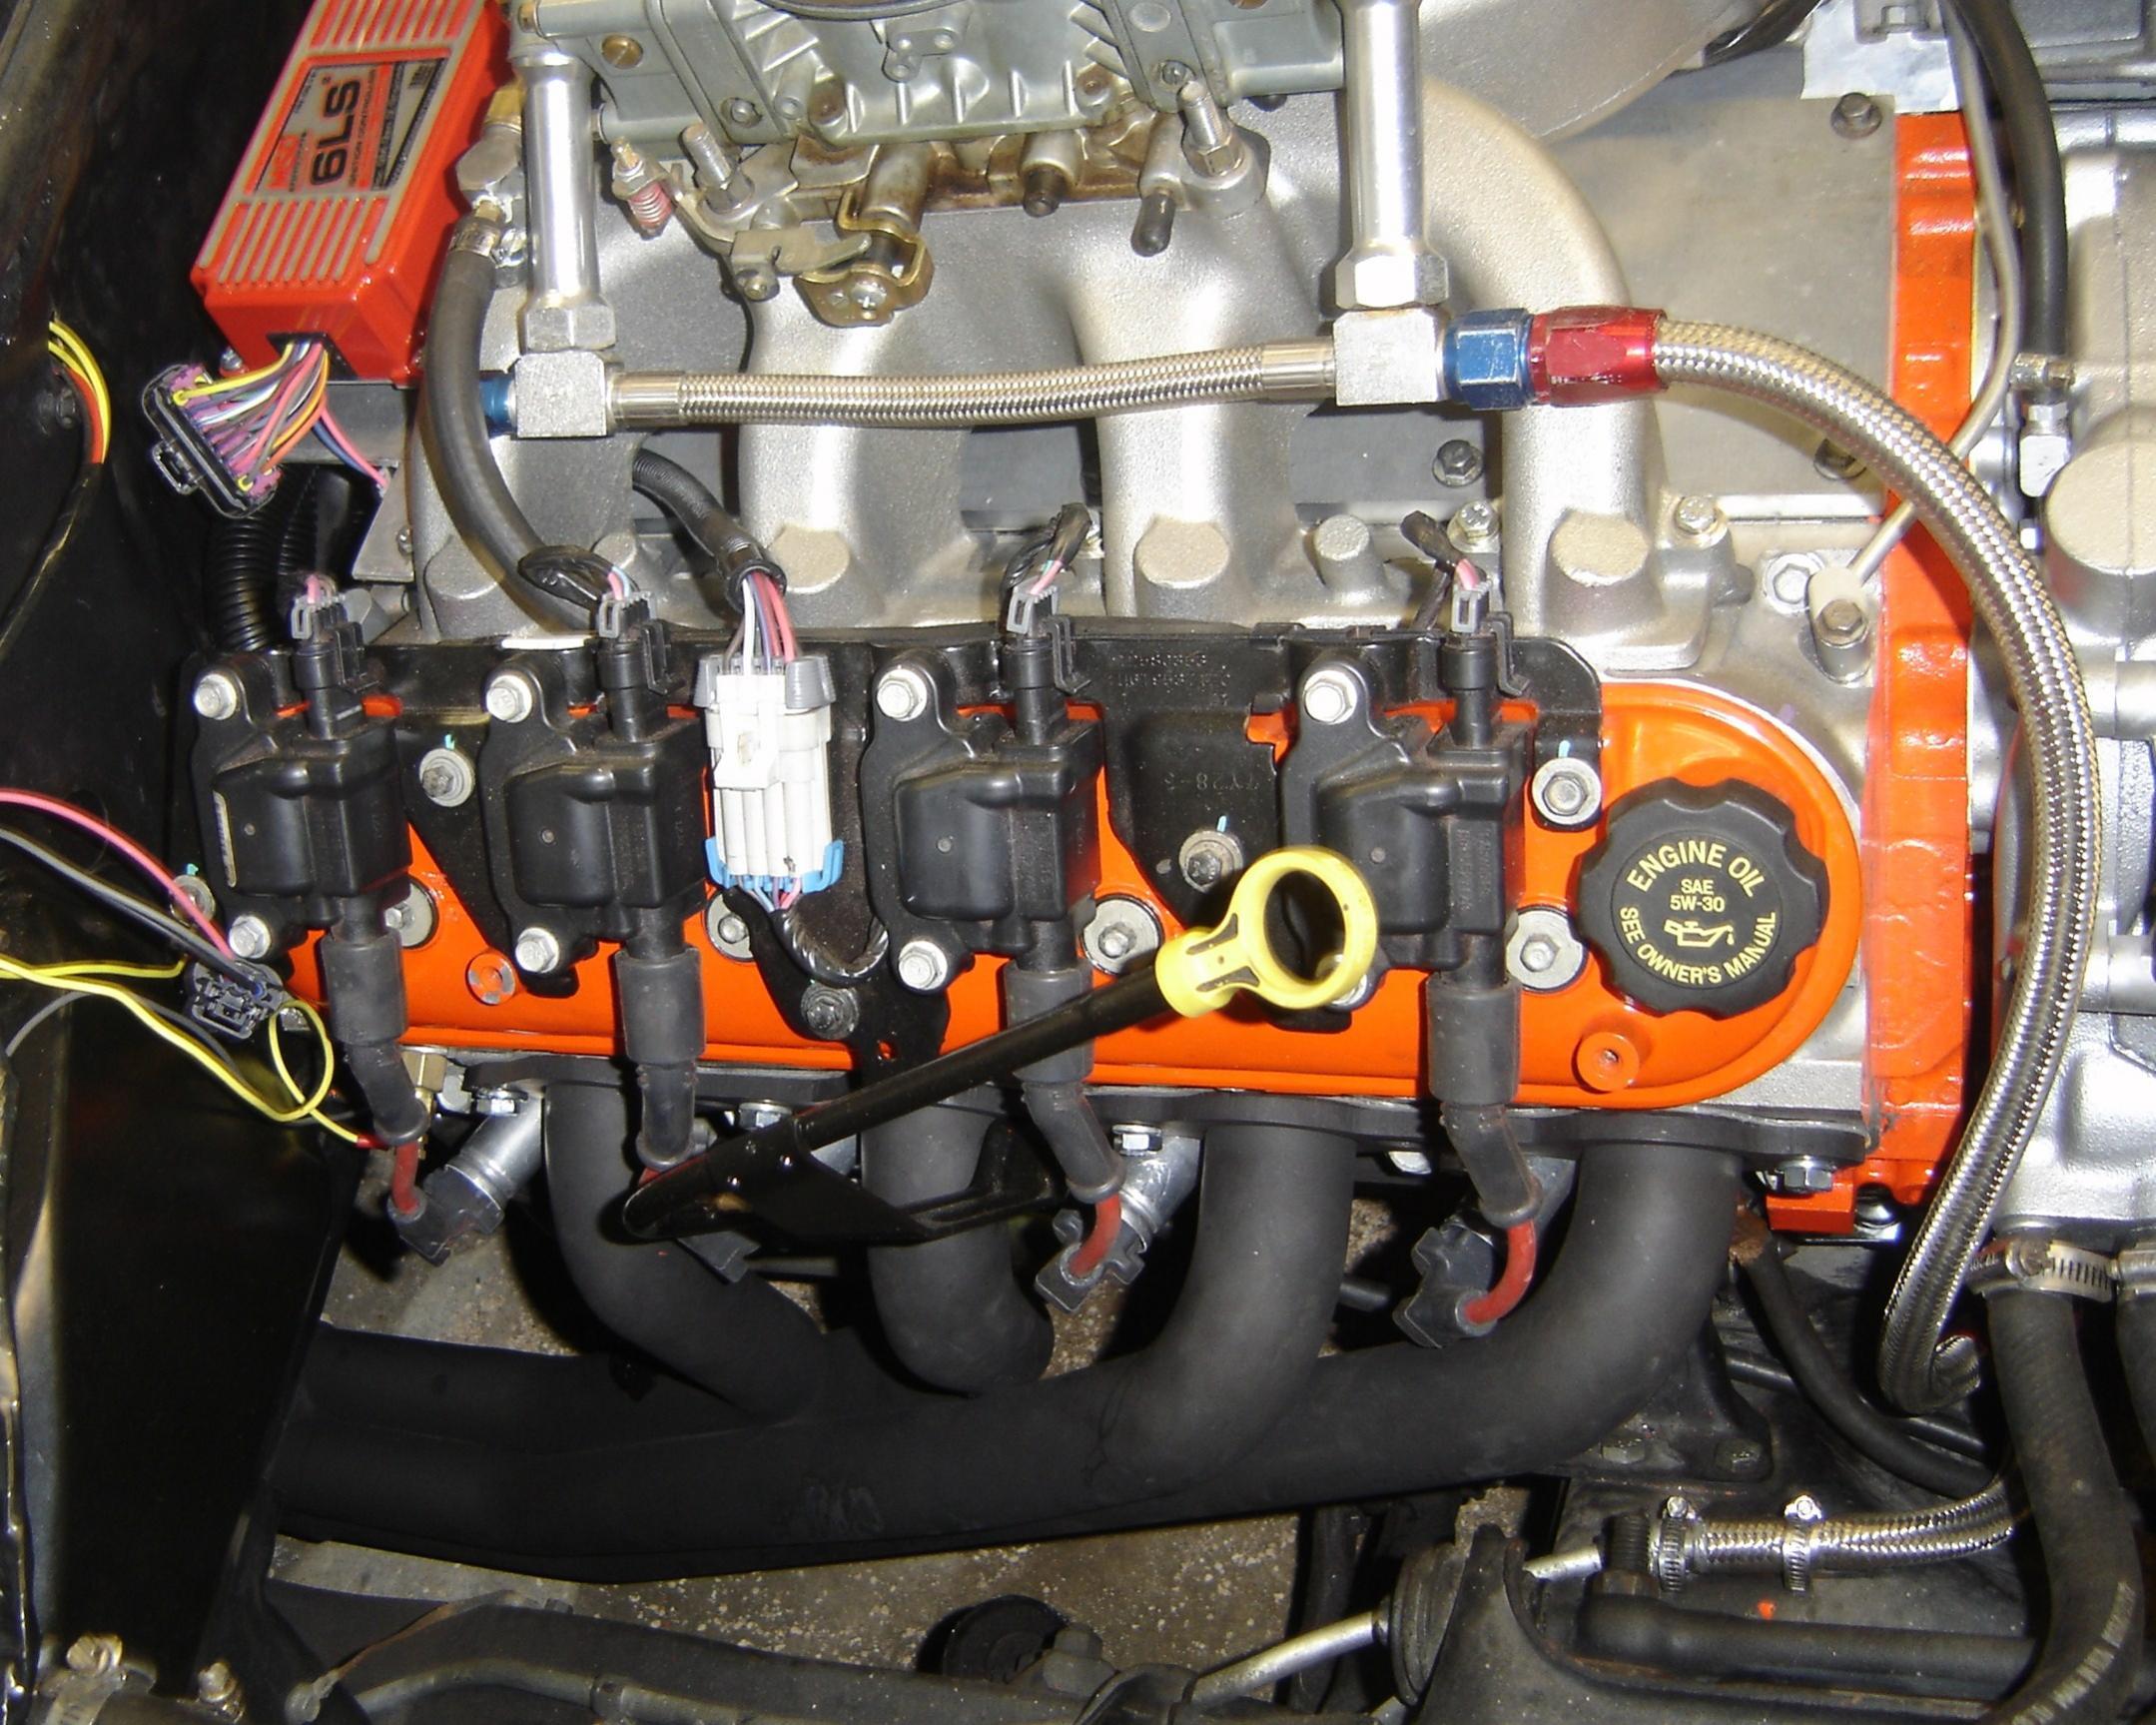 msd 6010 wiring harness 2006 vw jetta radio diagram best library mounting ideas ls1tech camaro and firebird universal ignition